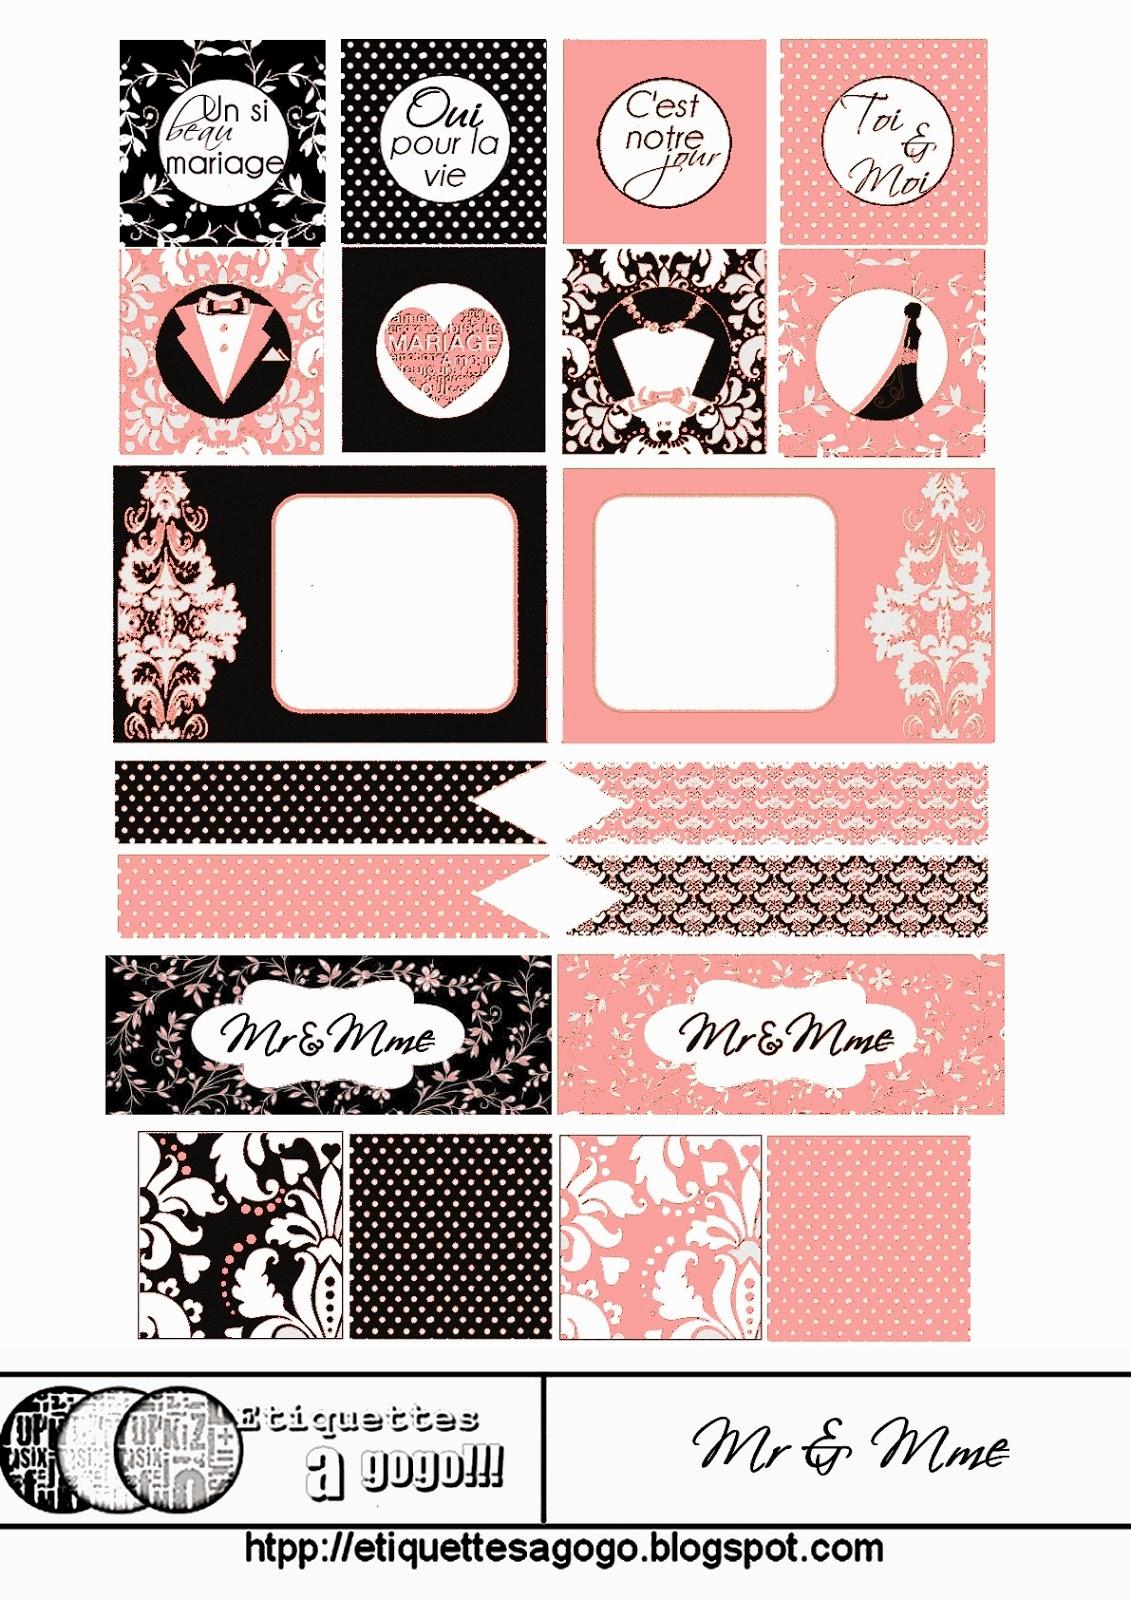 Bodas: Etiquetas de Diferentes Colores para Imprimir Gratis. | Ideas ...